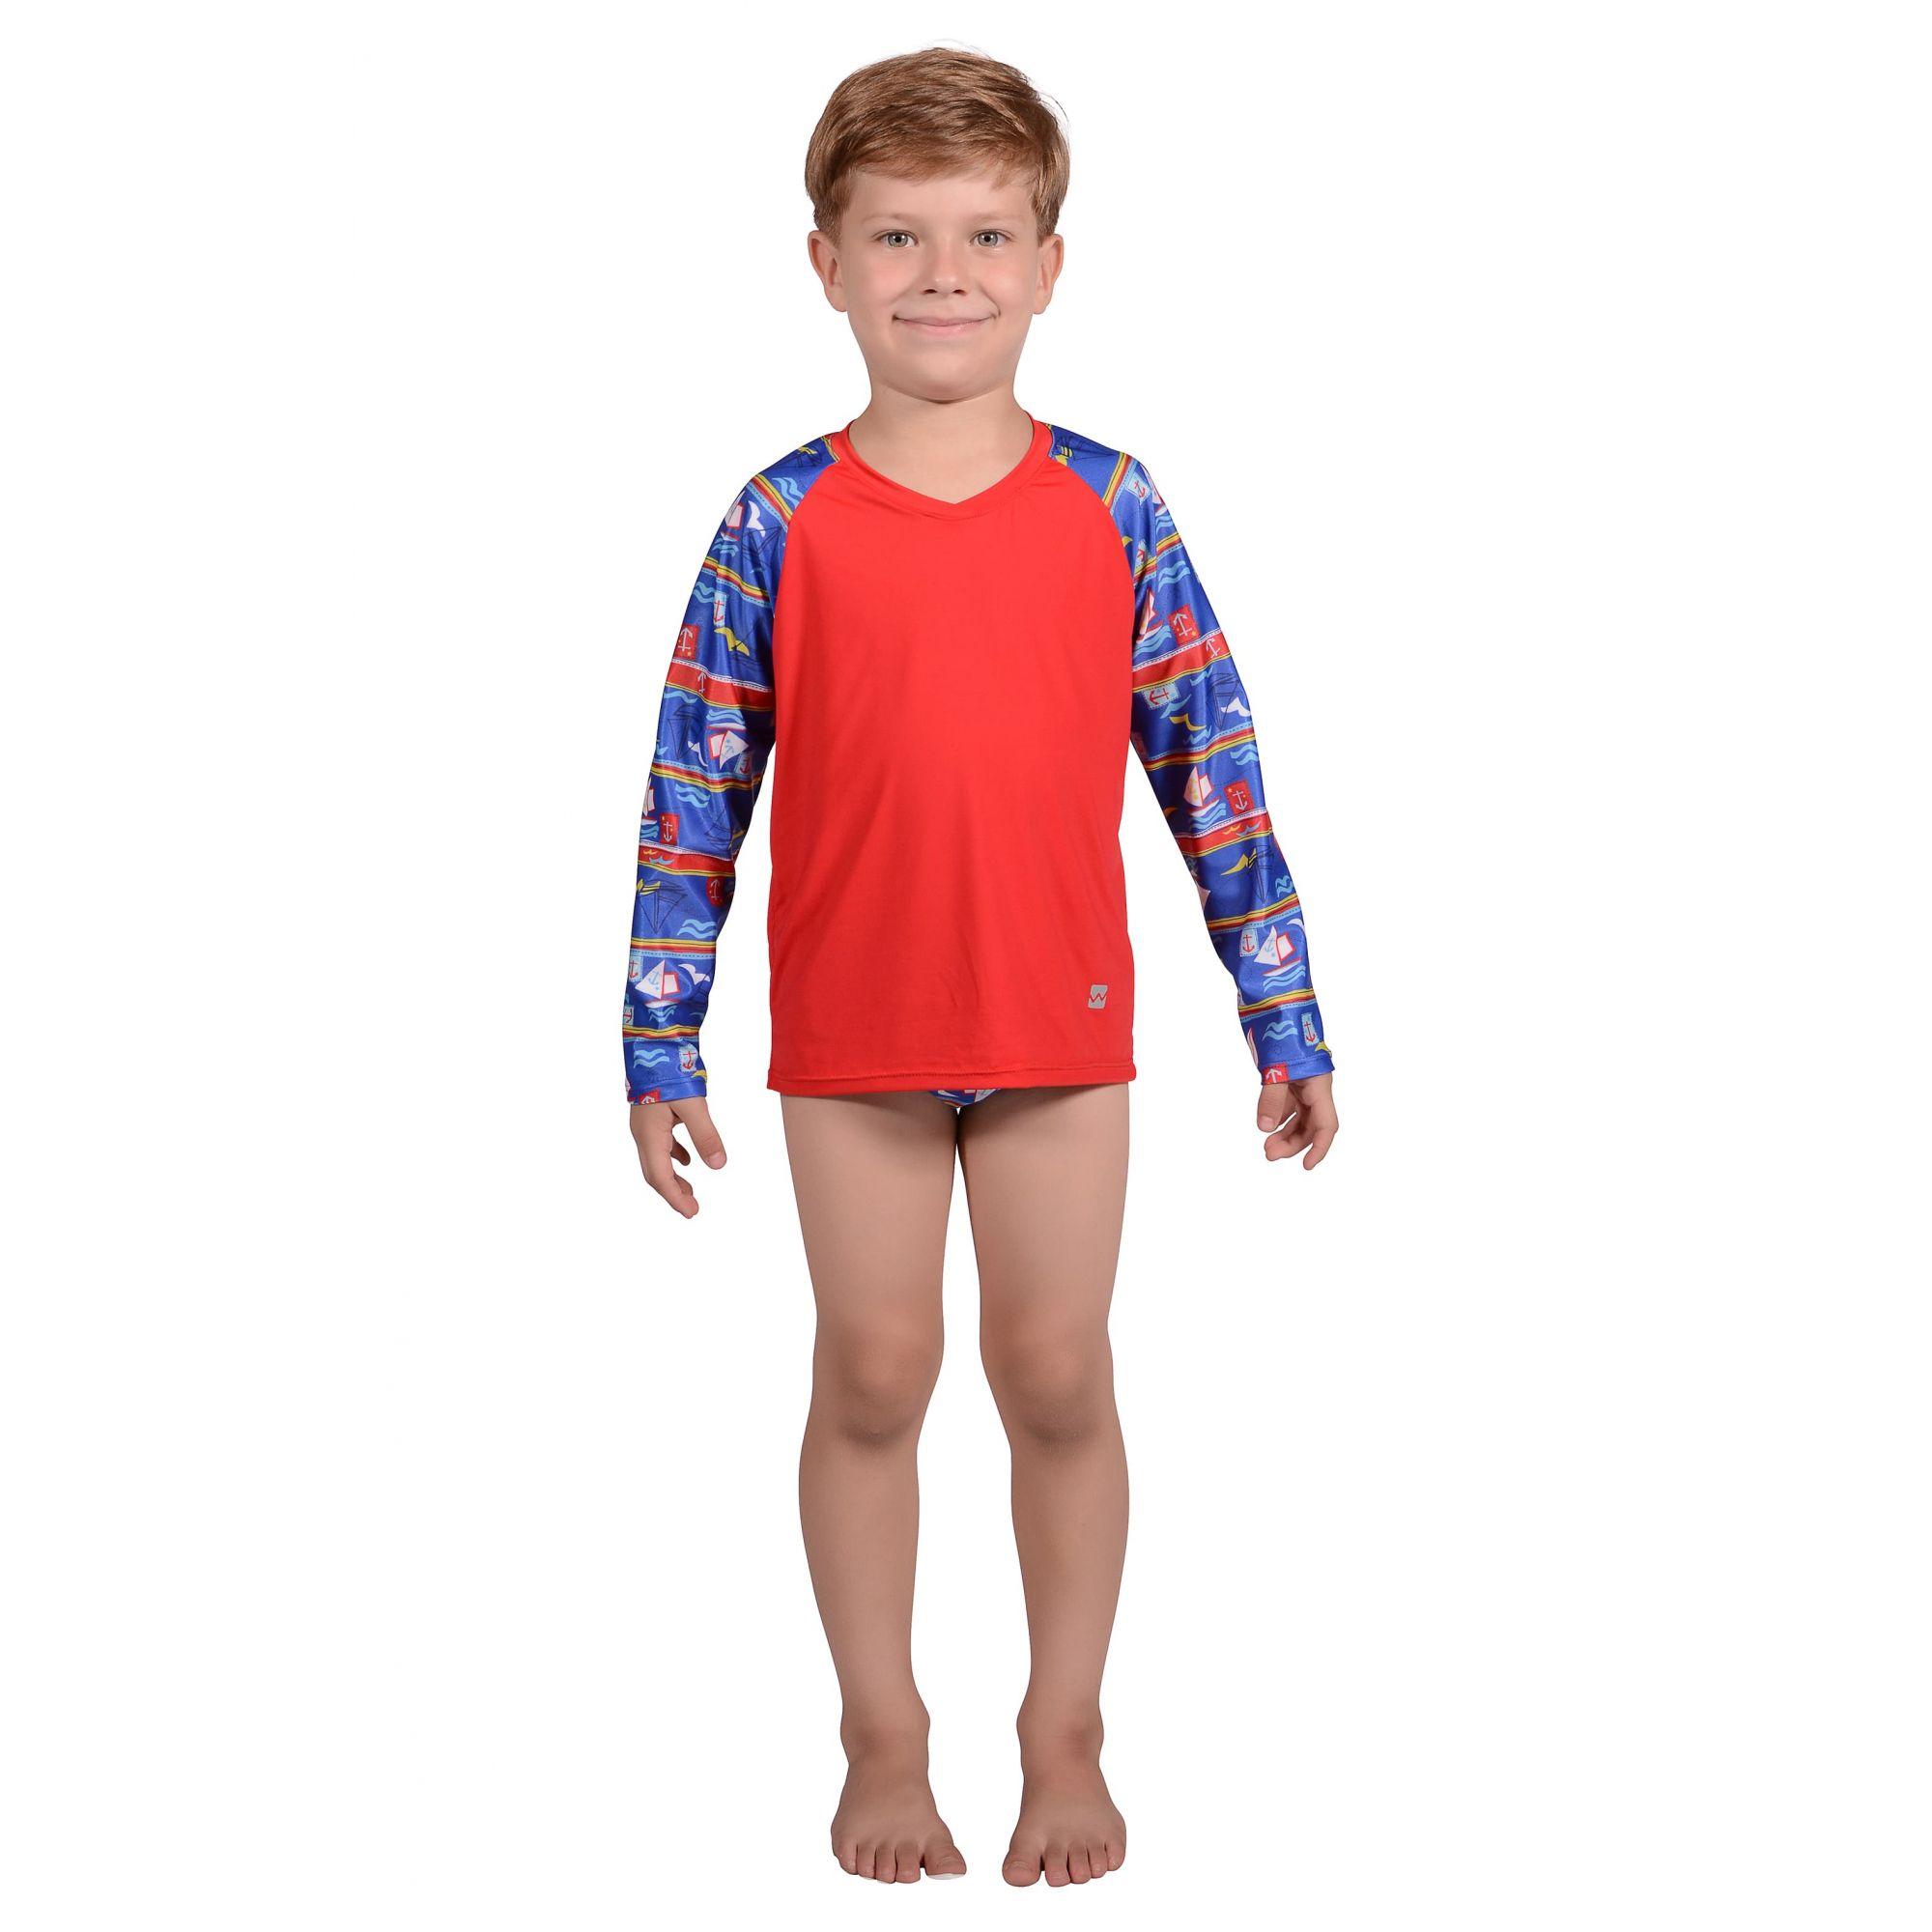 Camiseta Infantil Manga Longa UV 50+ Navy